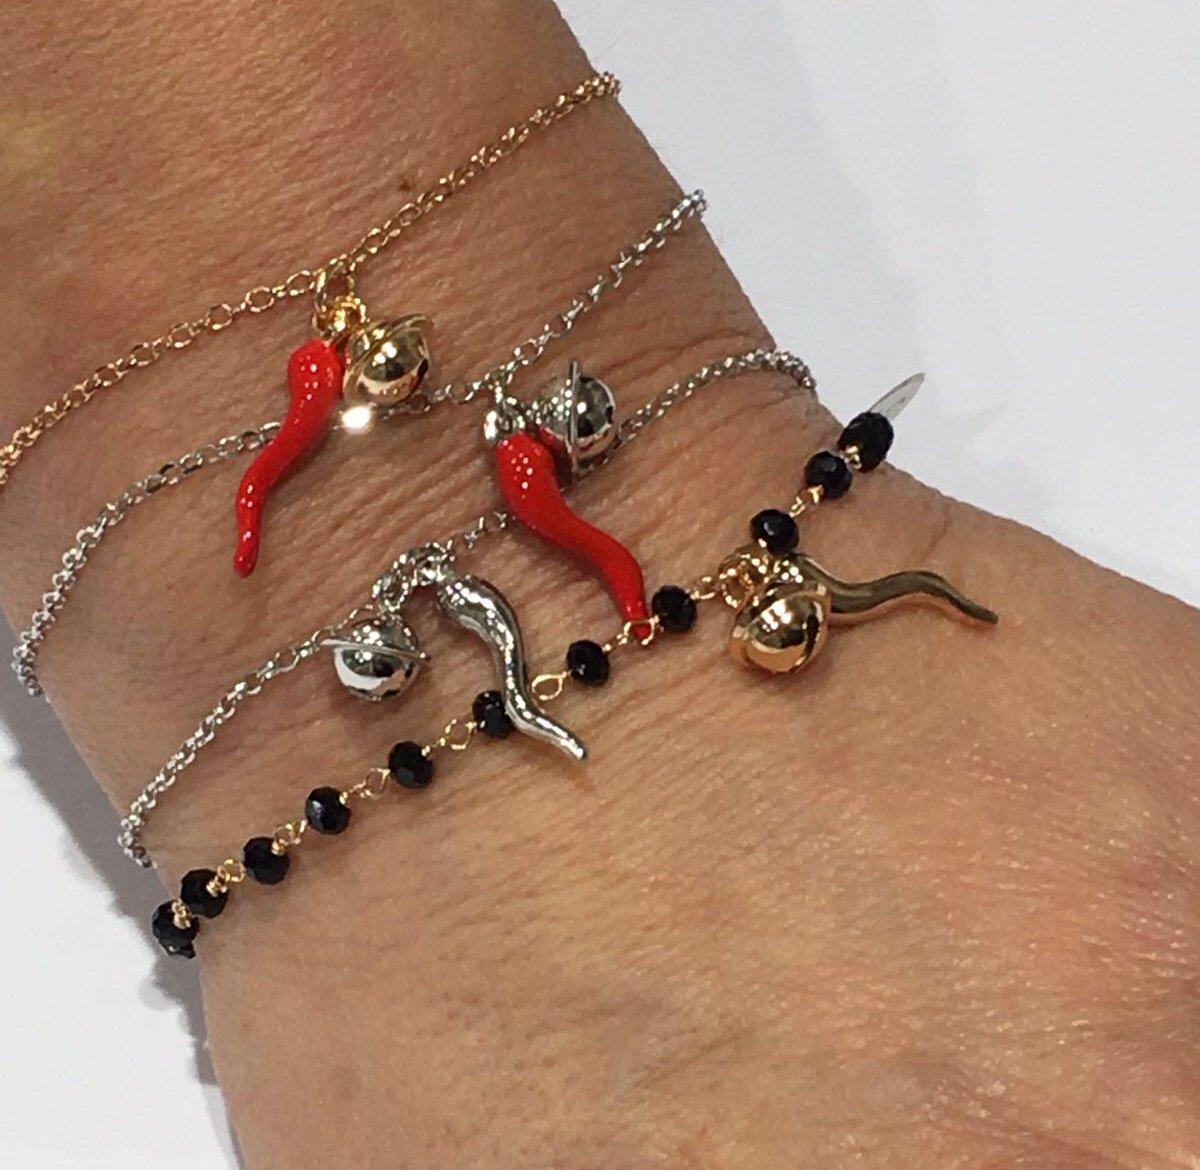 Image of Lucy bracelets